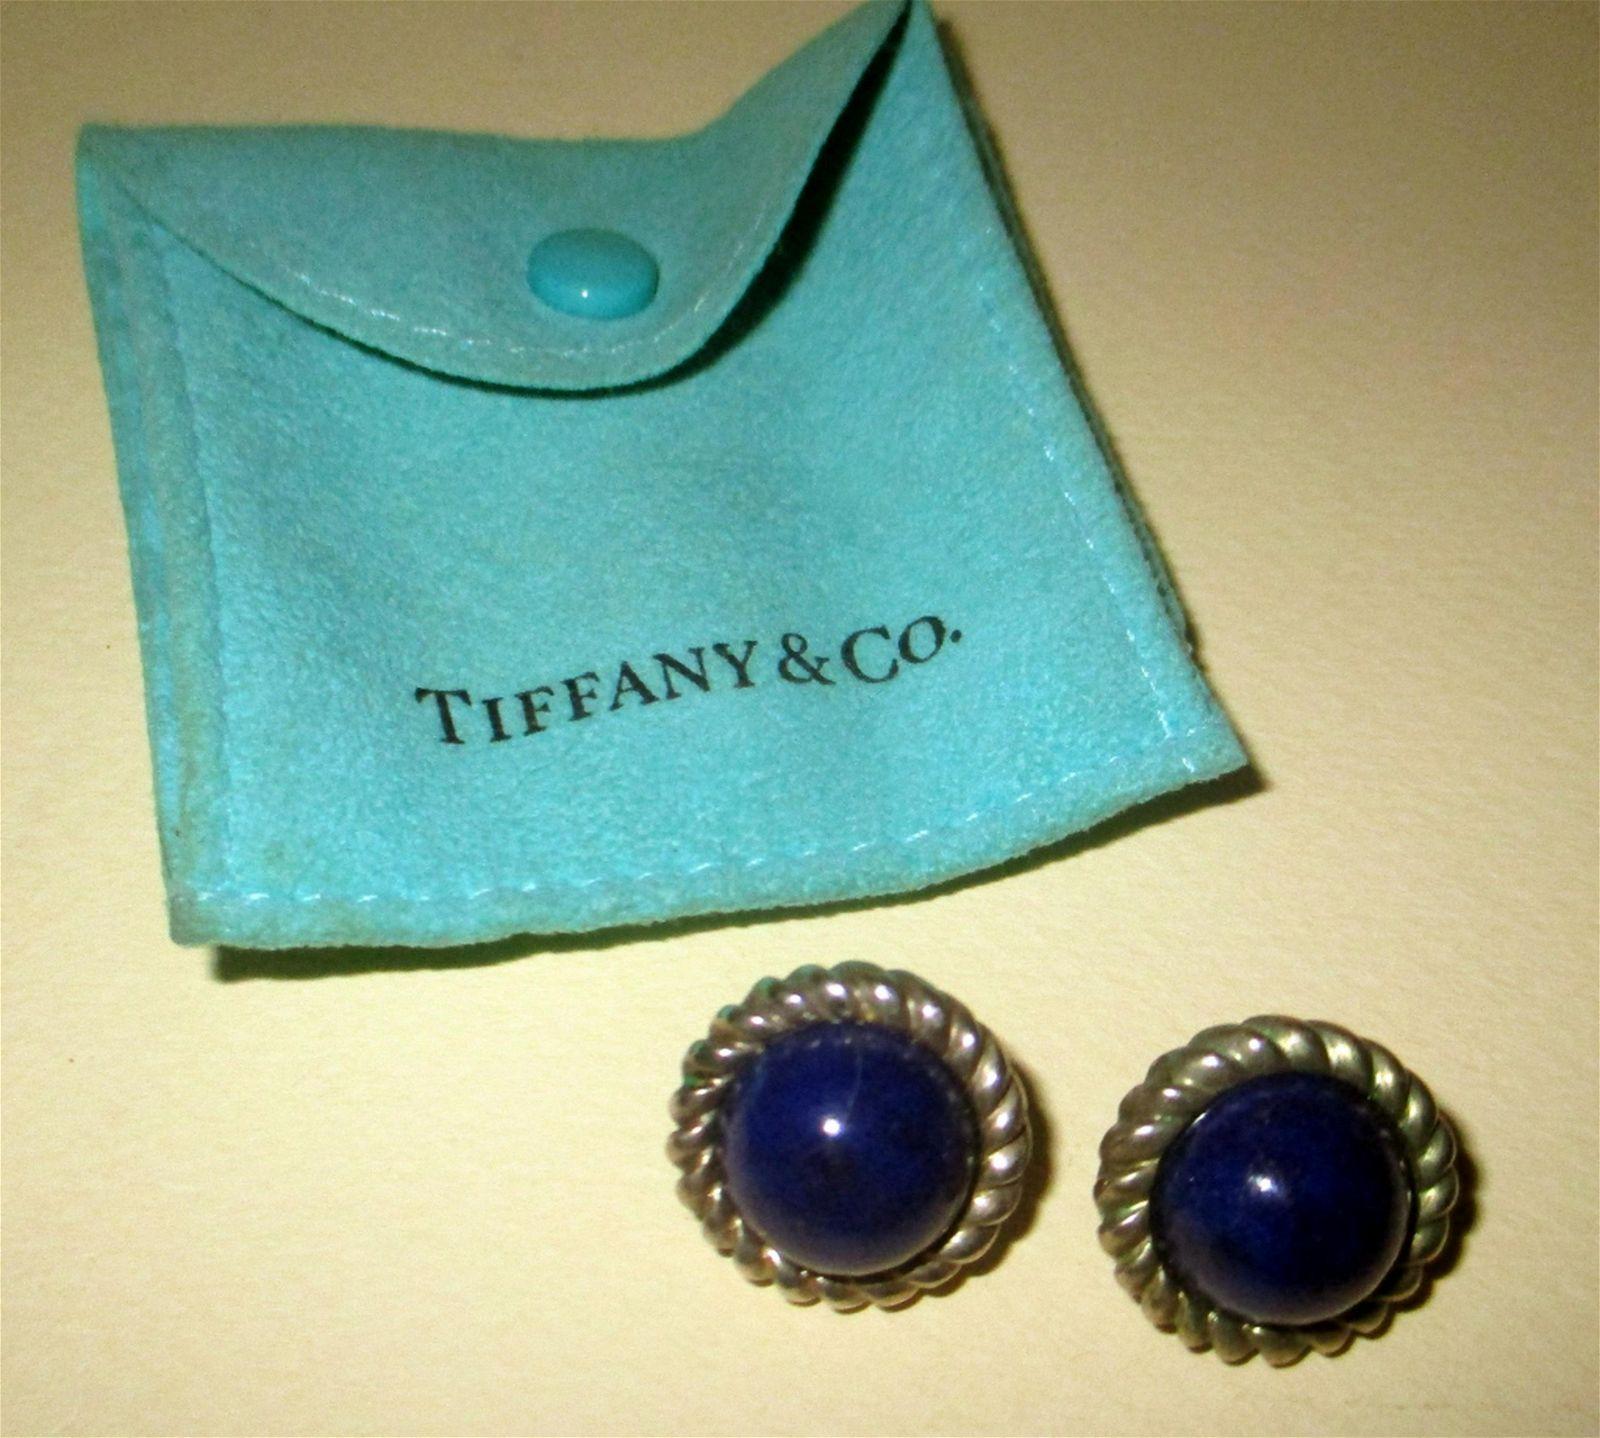 Pair of Tiffany & Co Earrings